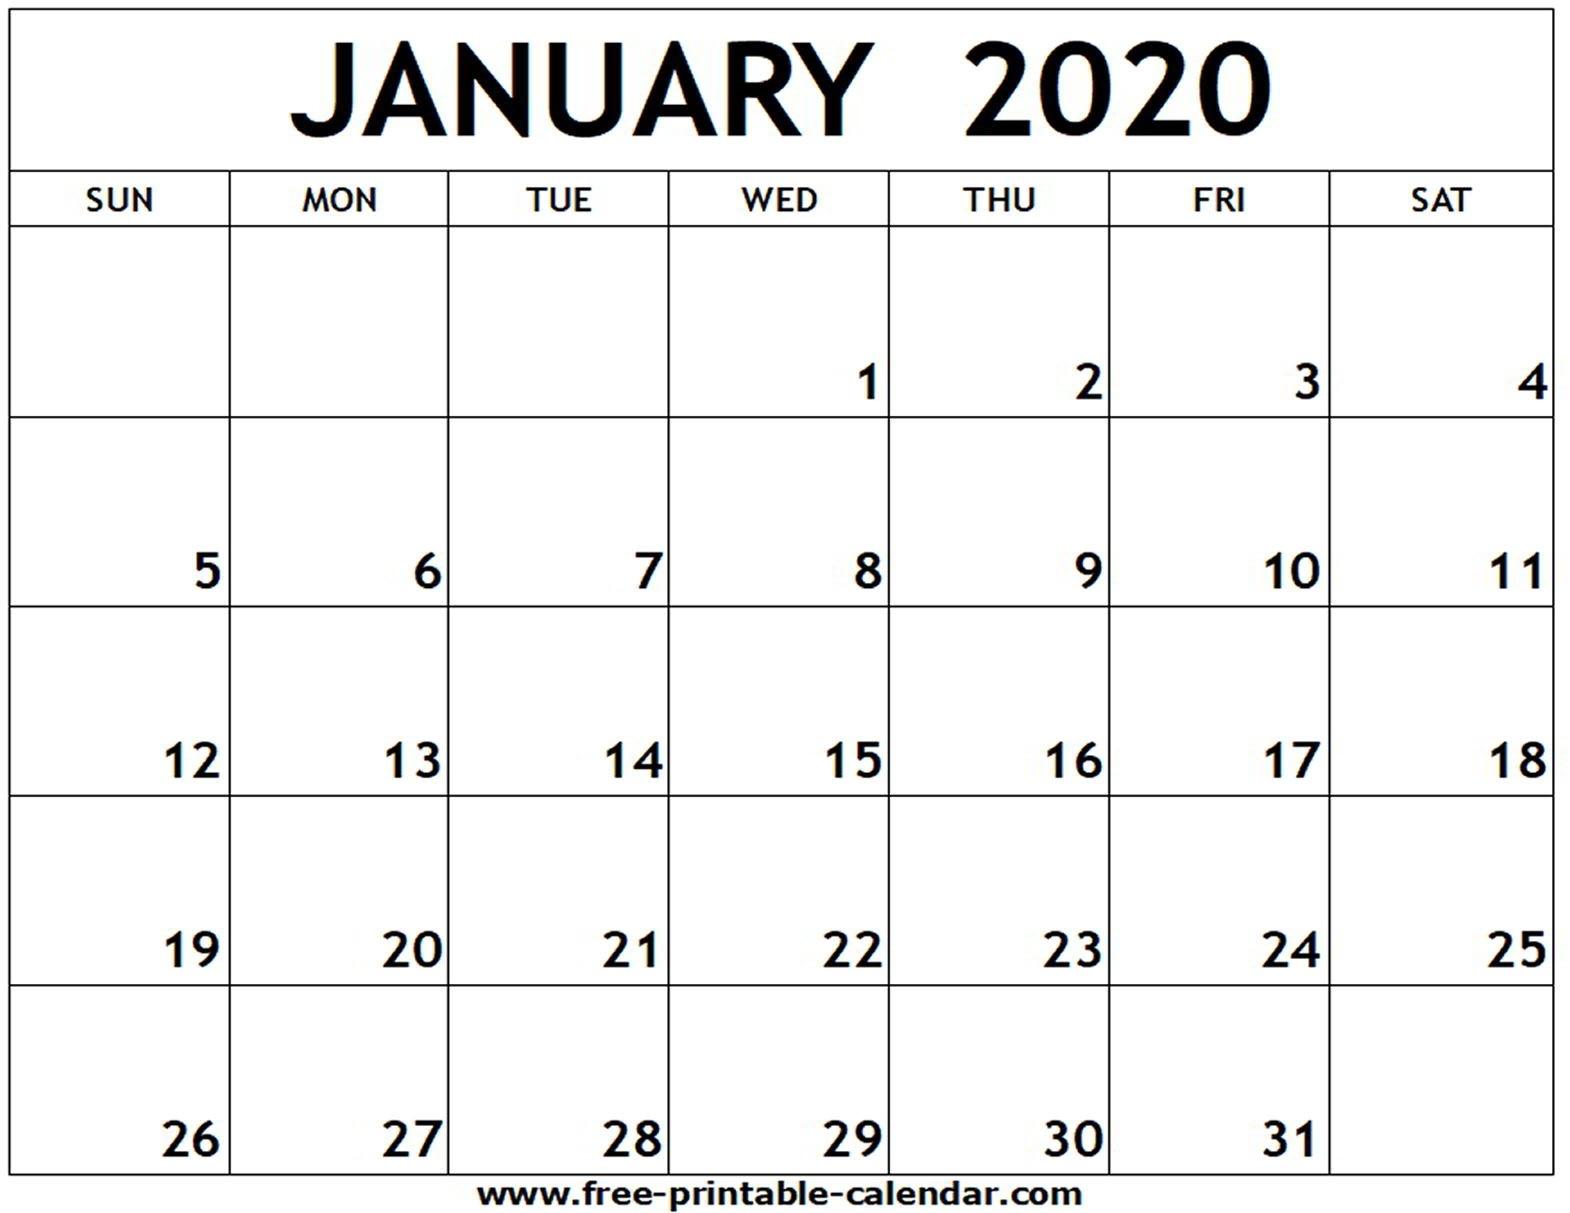 January 2020 Printable Calendar - Free-Printable-Calendar-January 2020 Calendar Portrait